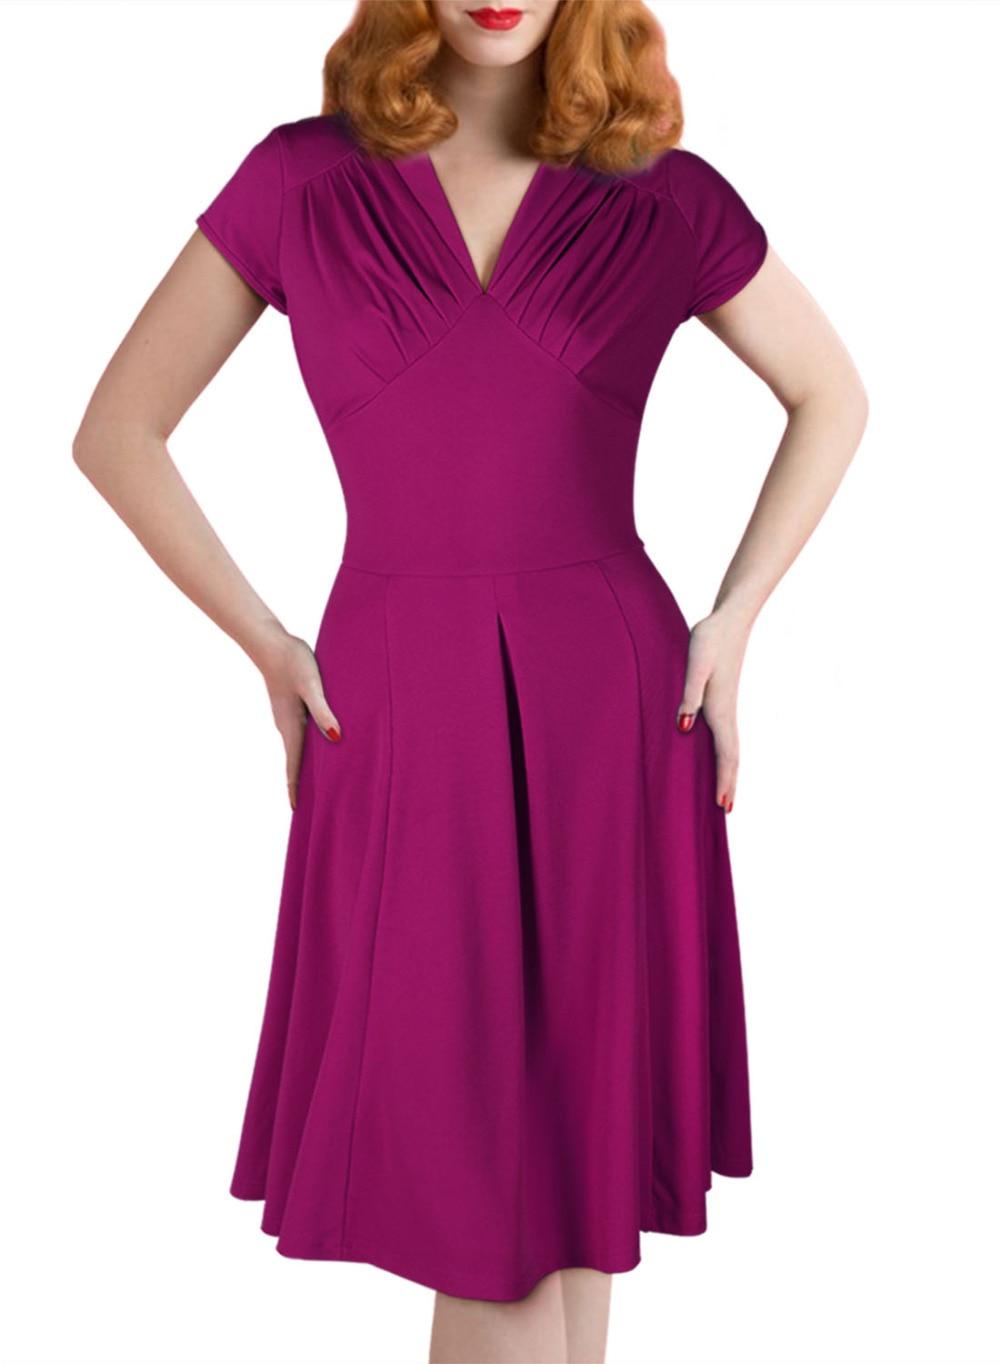 Vestido, para \' s Vintage estilo Retro 1940 s de la blusa evasé Tea ...